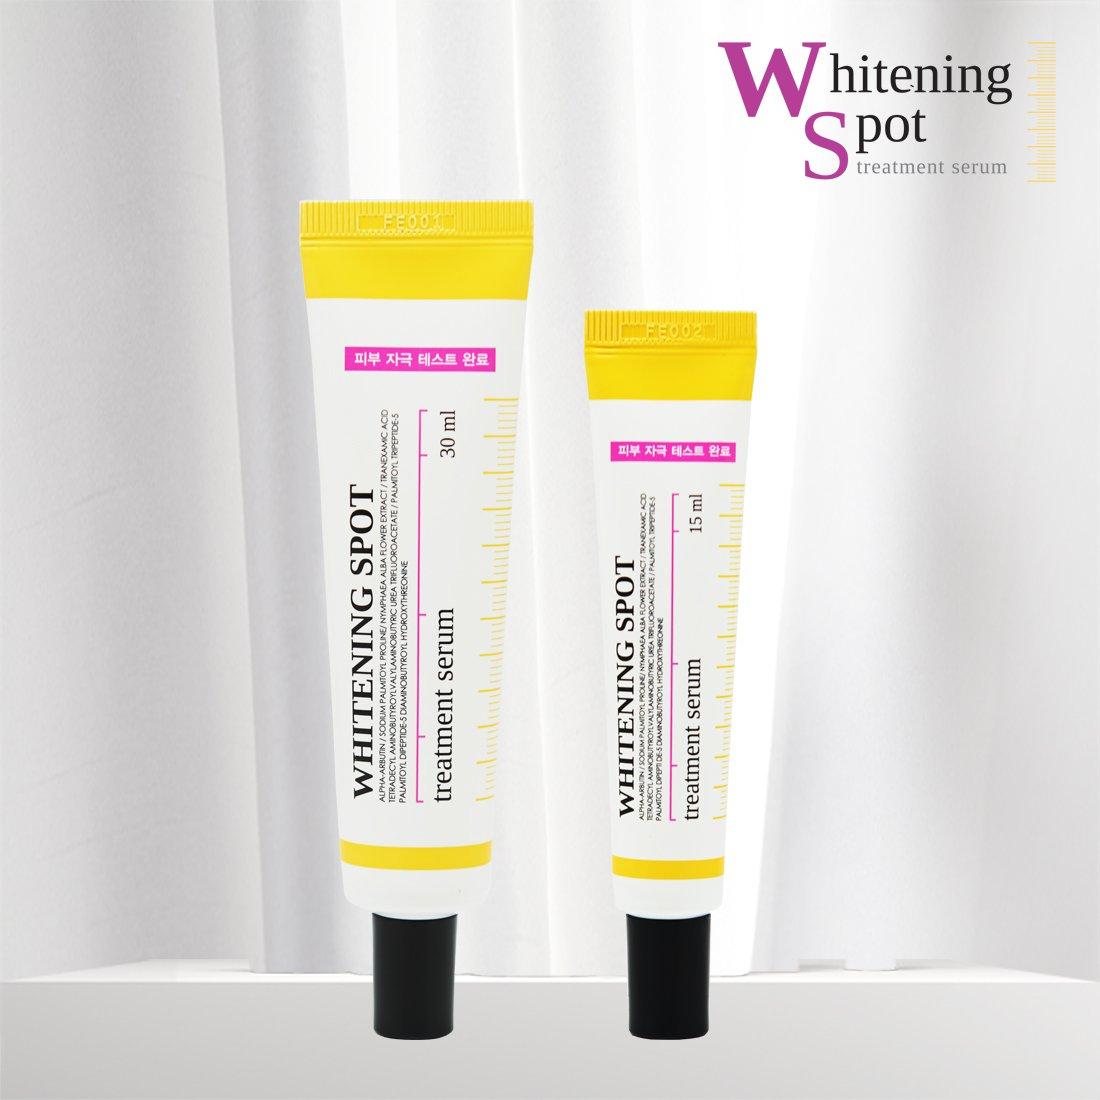 CNKCOS Whitening spot treatment serum / Made in Korea (30ml) City Color F-0054C Blotting Paper - Green Tea Scented